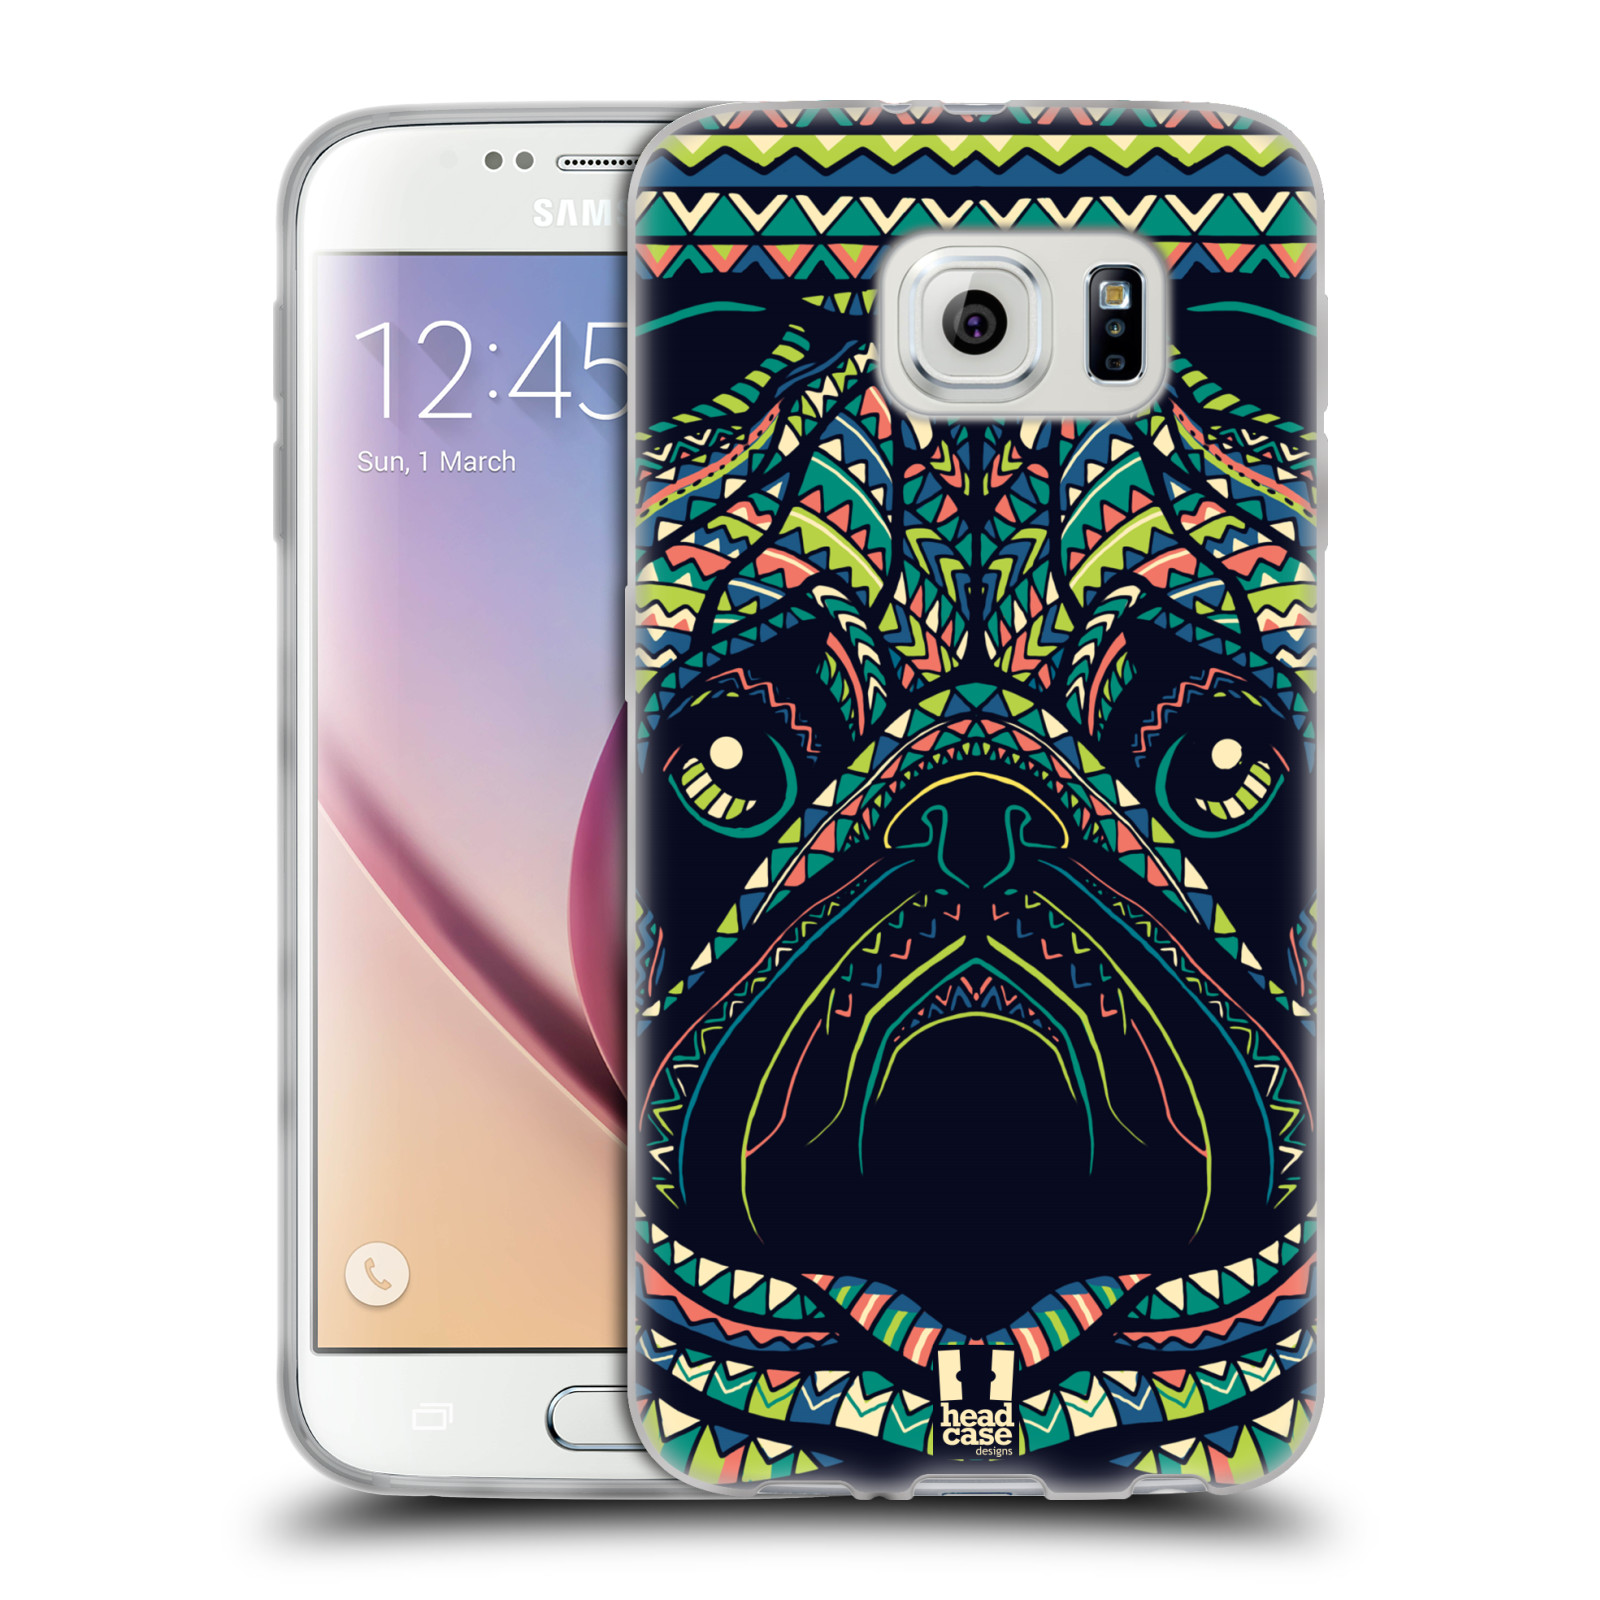 HEAD CASE silikonový obal na mobil Samsung Galaxy S6 vzor Aztécký motiv zvíře 3 mopsík